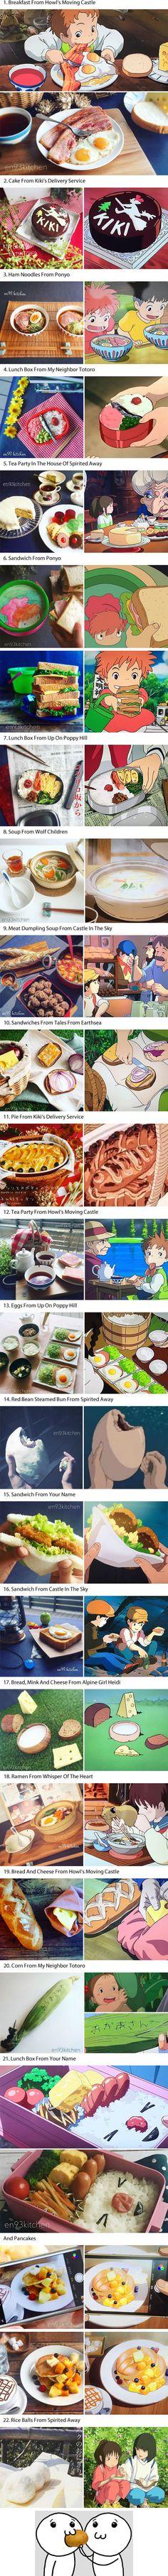 Japanese Woman Recreates The Delicious Food From Studio Ghib. - Japanese Woman Recreates The Delicious Food From Studio Ghibli Films , Manga Anime, Film Manga, Anime Art, Anime Films, Totoro, Art Studio Ghibli, Studio Ghibli Movies, Studio Ghibli Quotes, Hayao Miyazaki